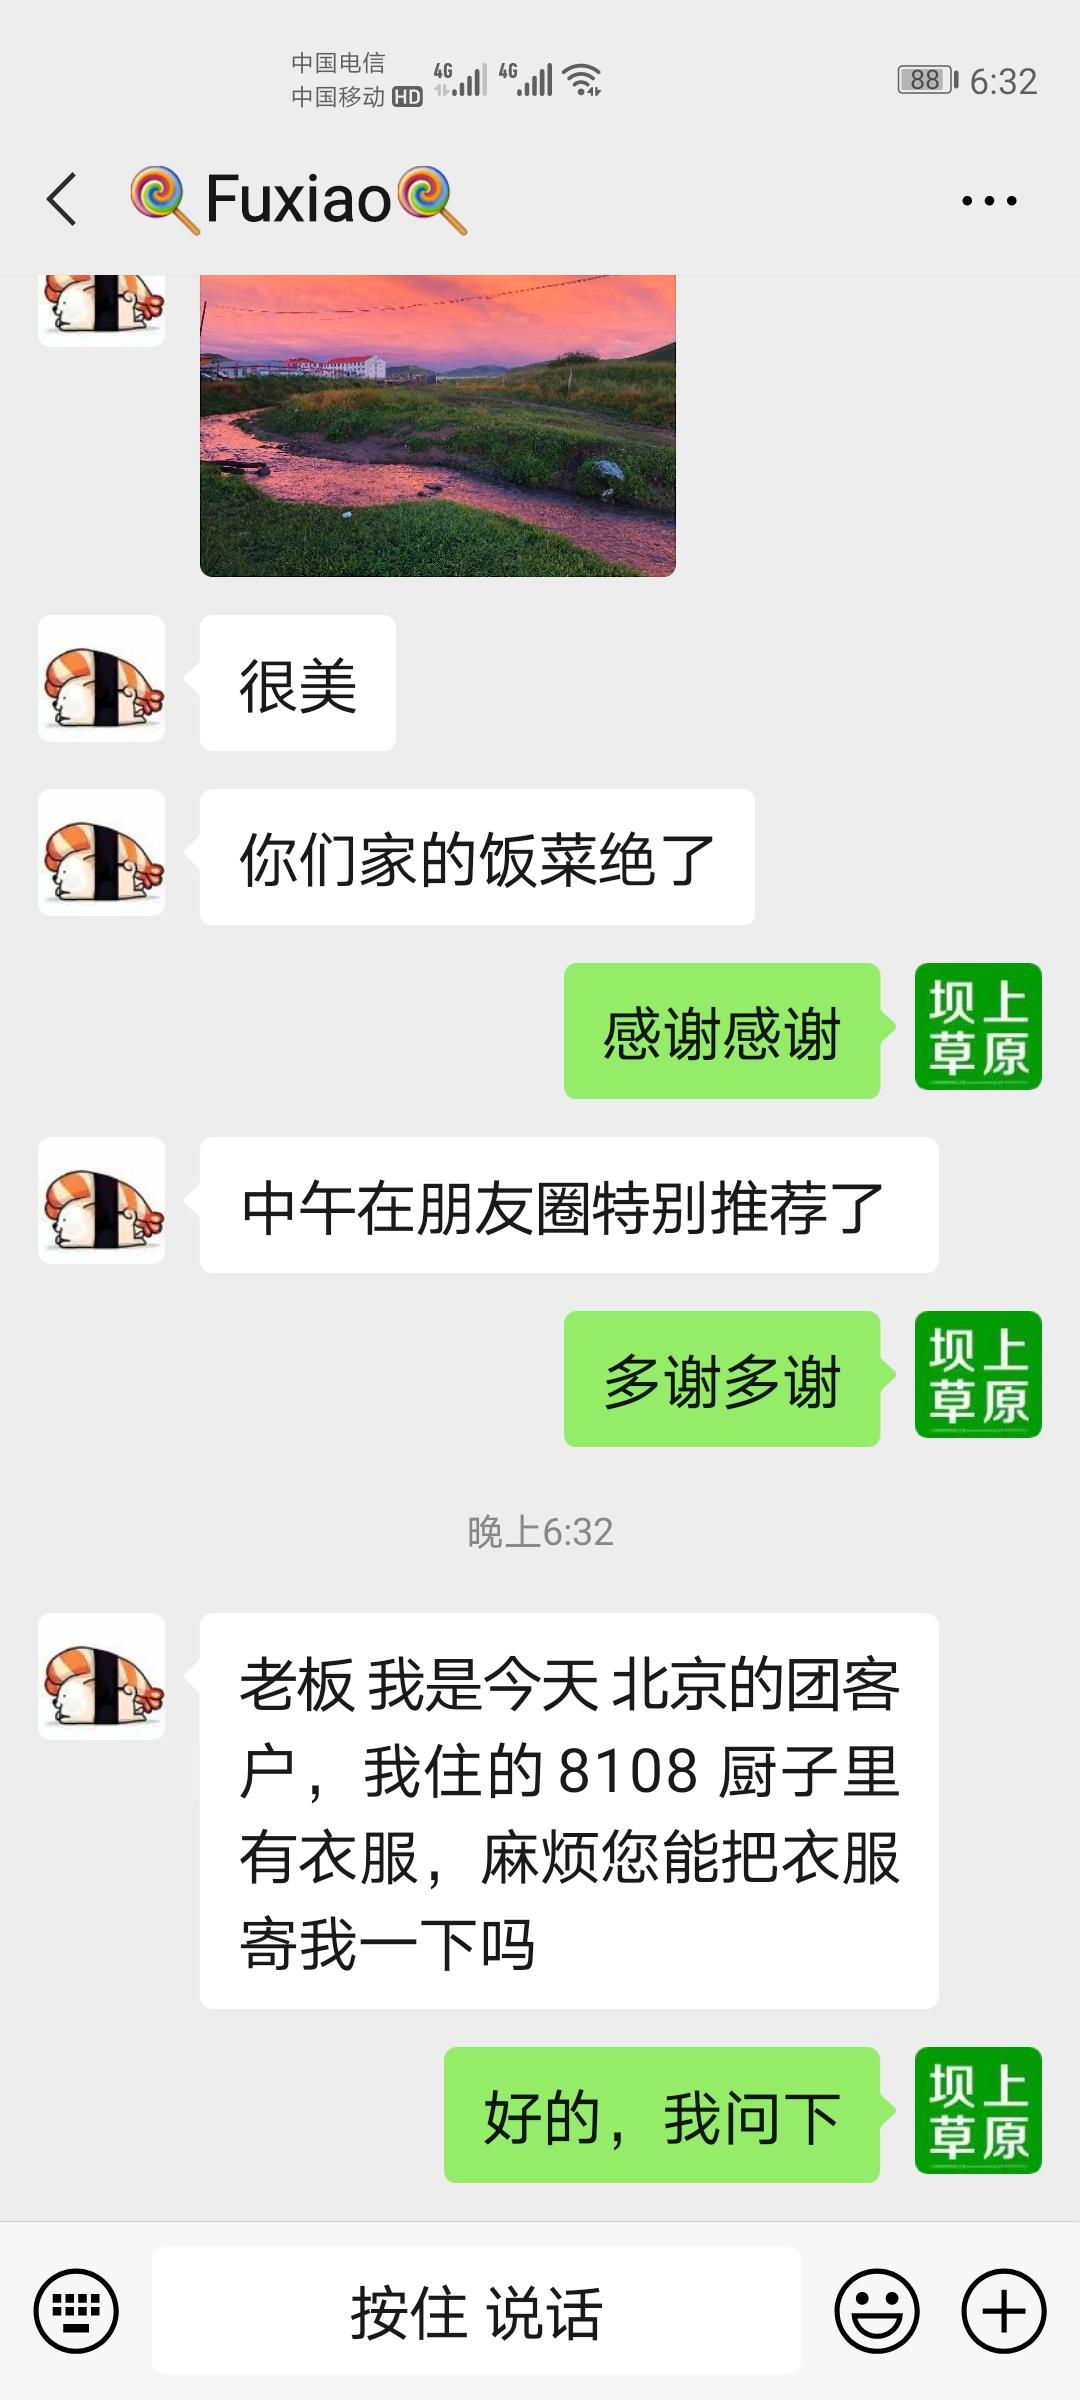 Fuxiao同学对咱家远山别院评价